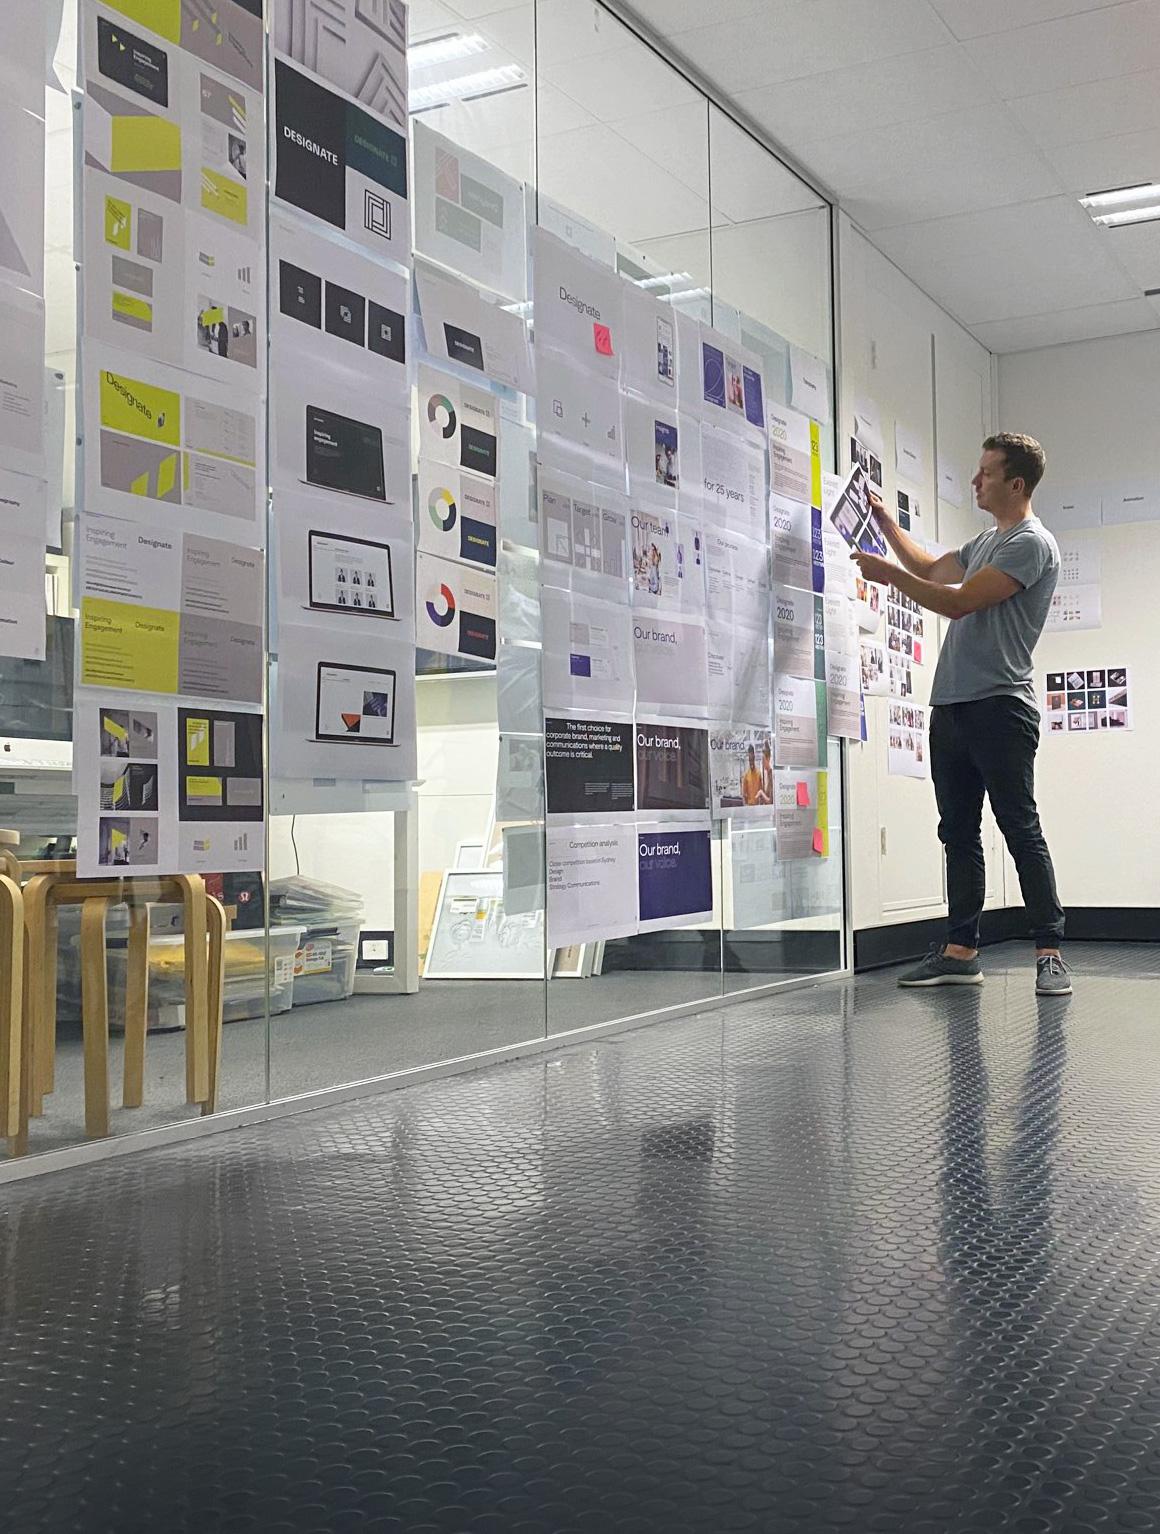 Designate Creative Director reviewing design work.